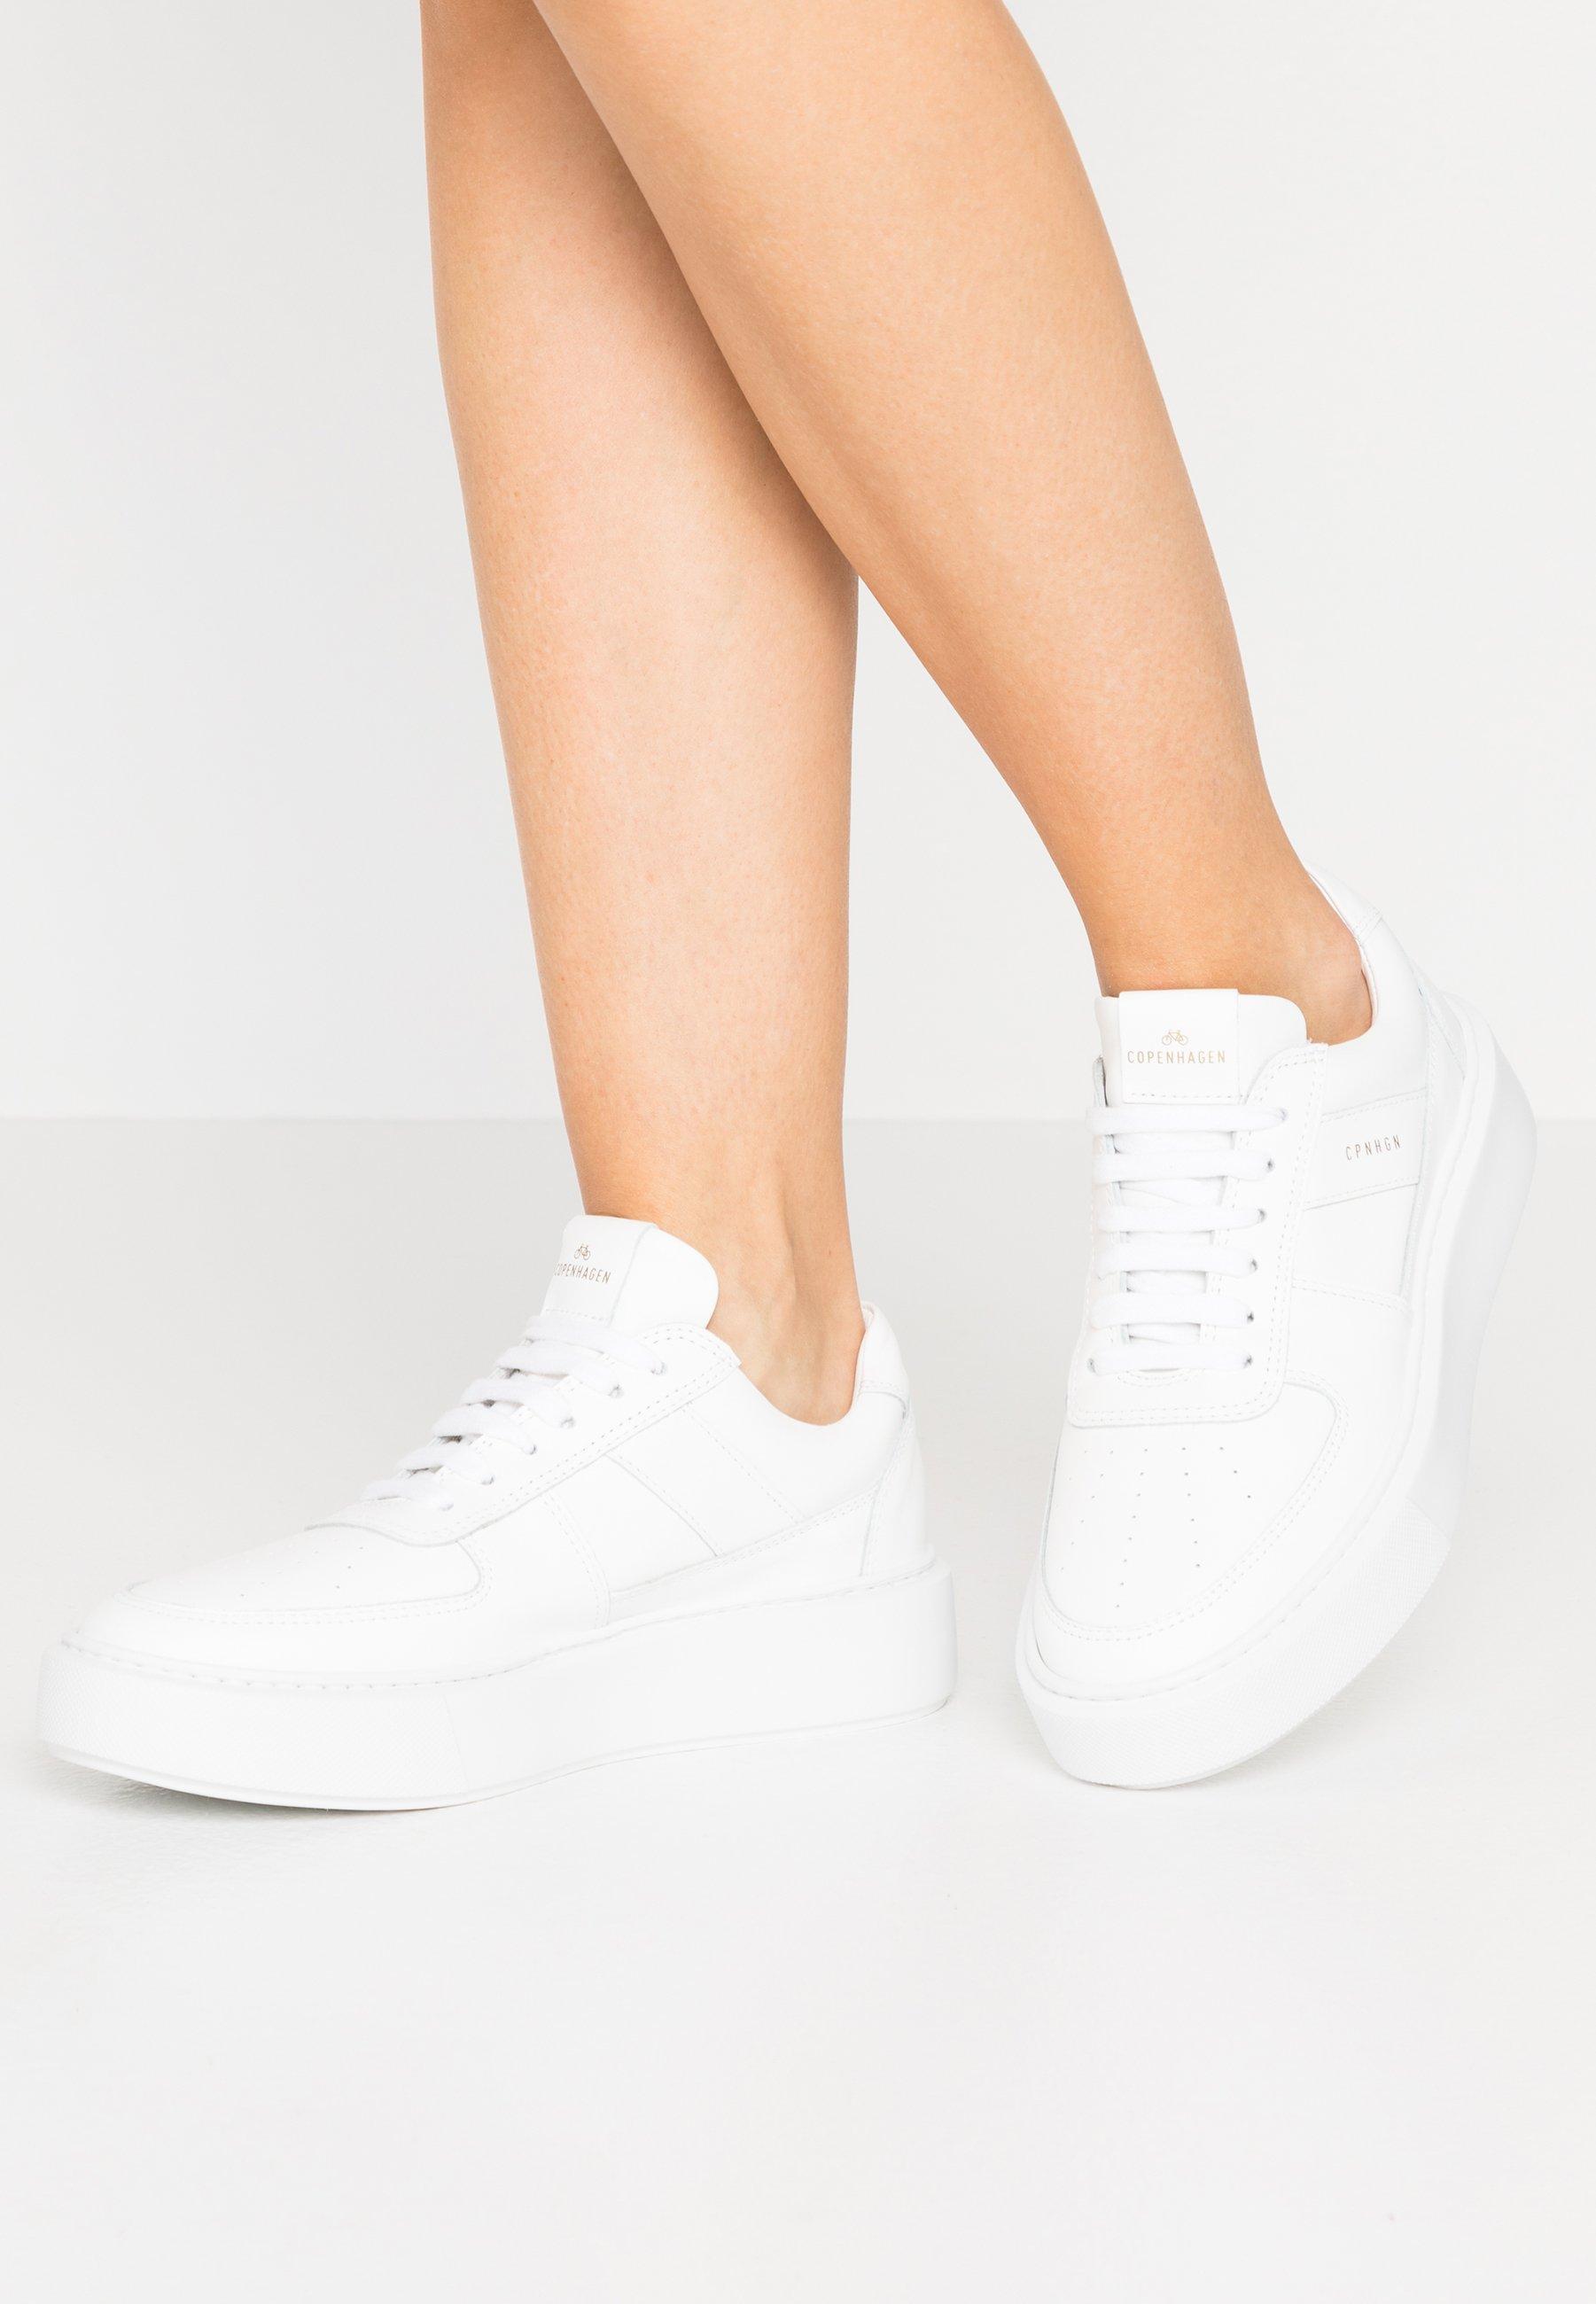 CPH152 Sneakers white